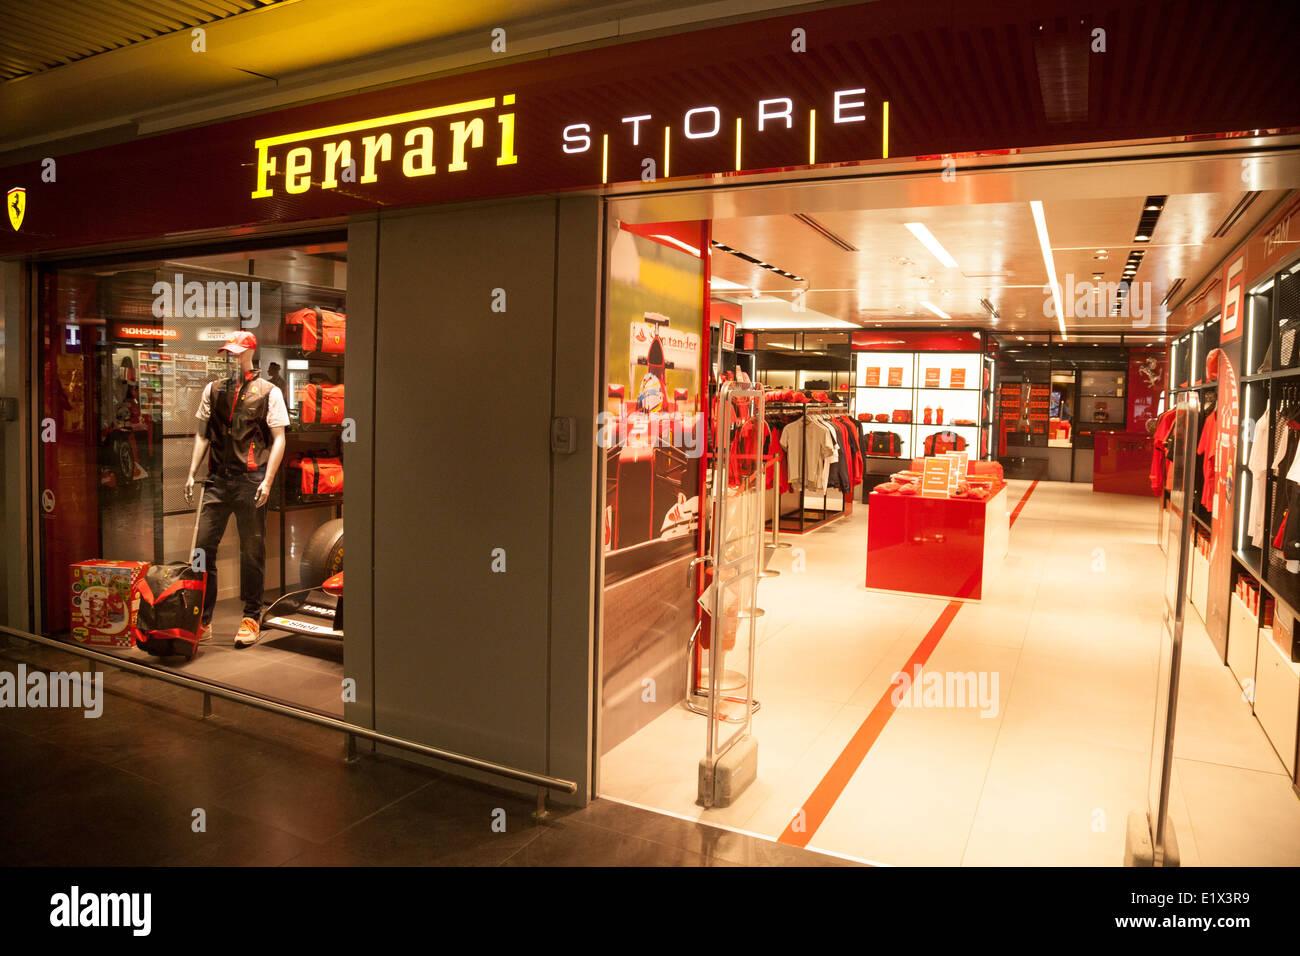 The Ferrari store or shop; Rome Fiumicino airport departure lounge, Rome Italy Europe - Stock Image